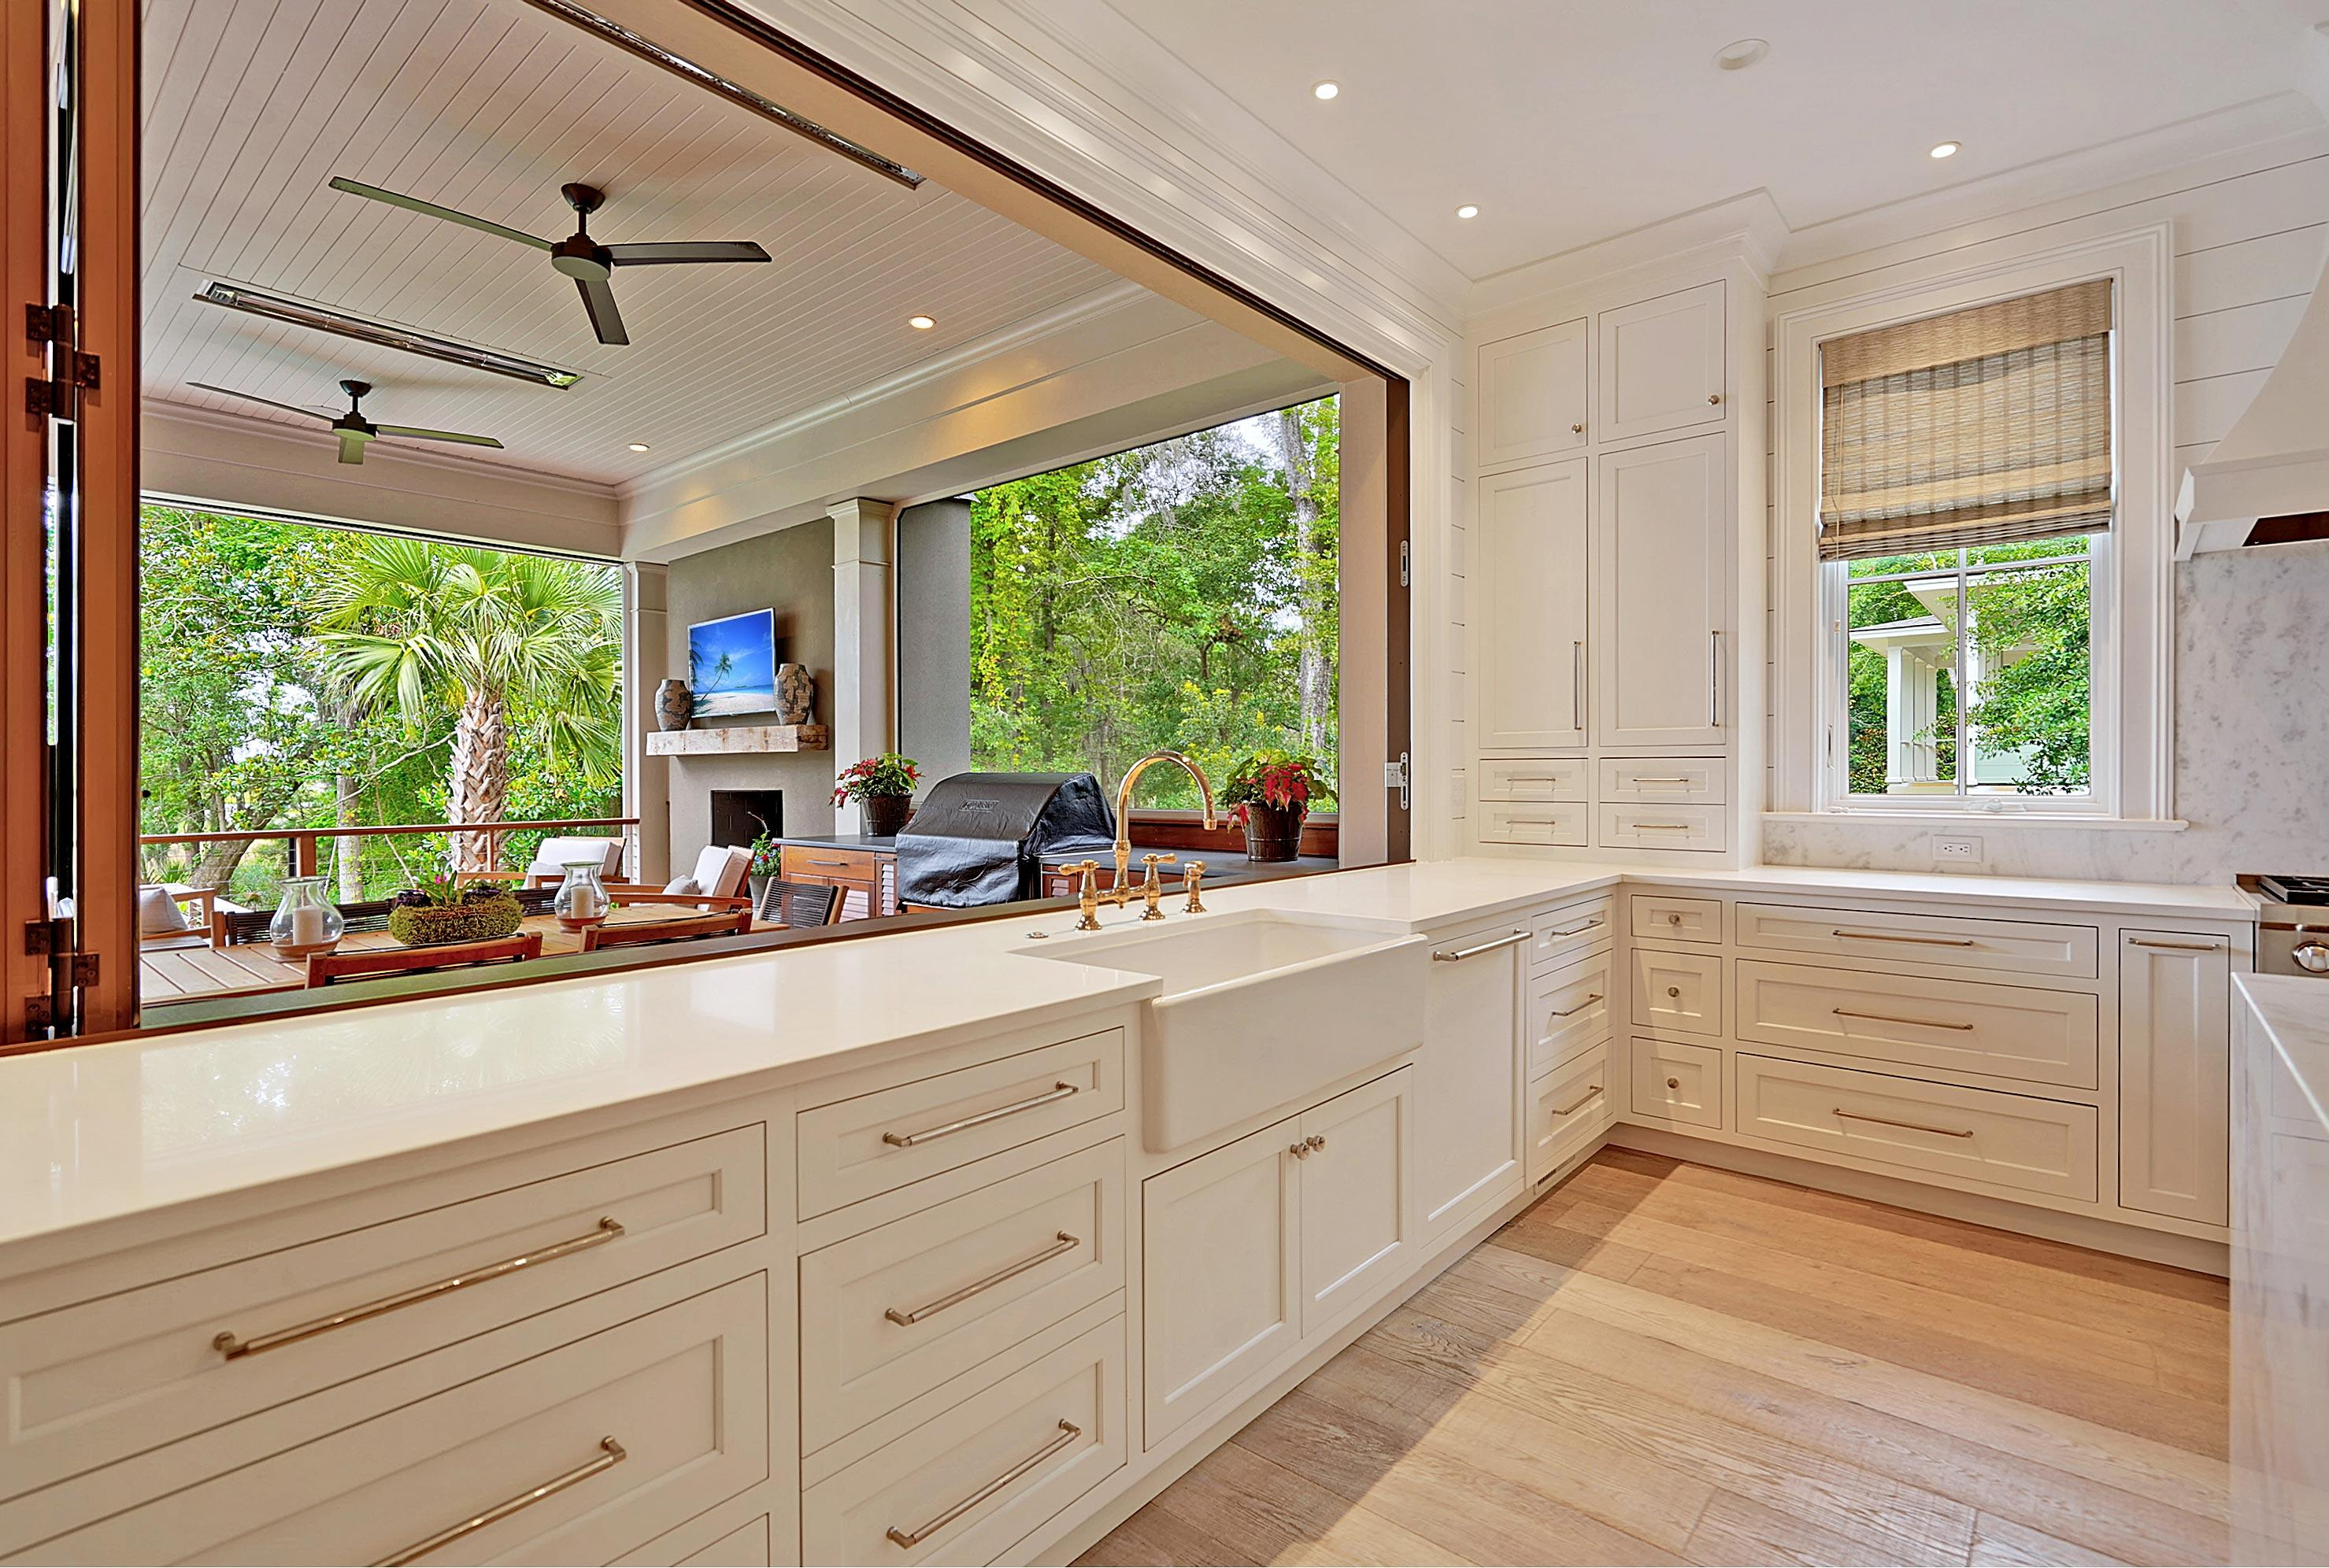 Beresford Hall Homes For Sale - 621 Barbados, Charleston, SC - 0